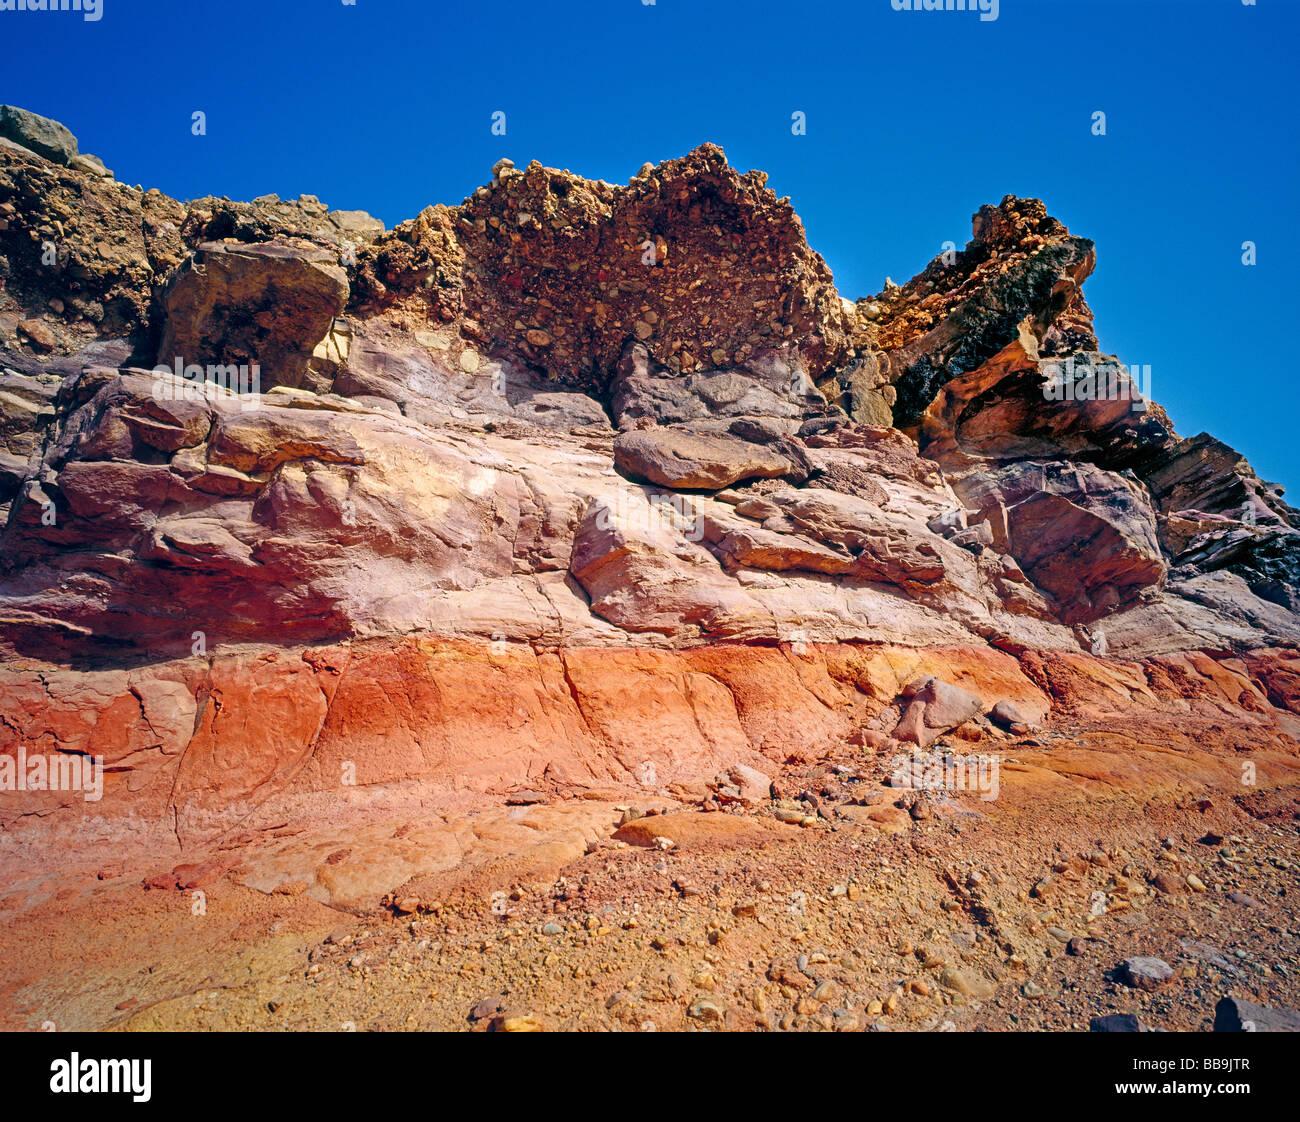 colouful rock formation farbige Felsformation in Muscat Maskat Quantab Oman - Stock Image